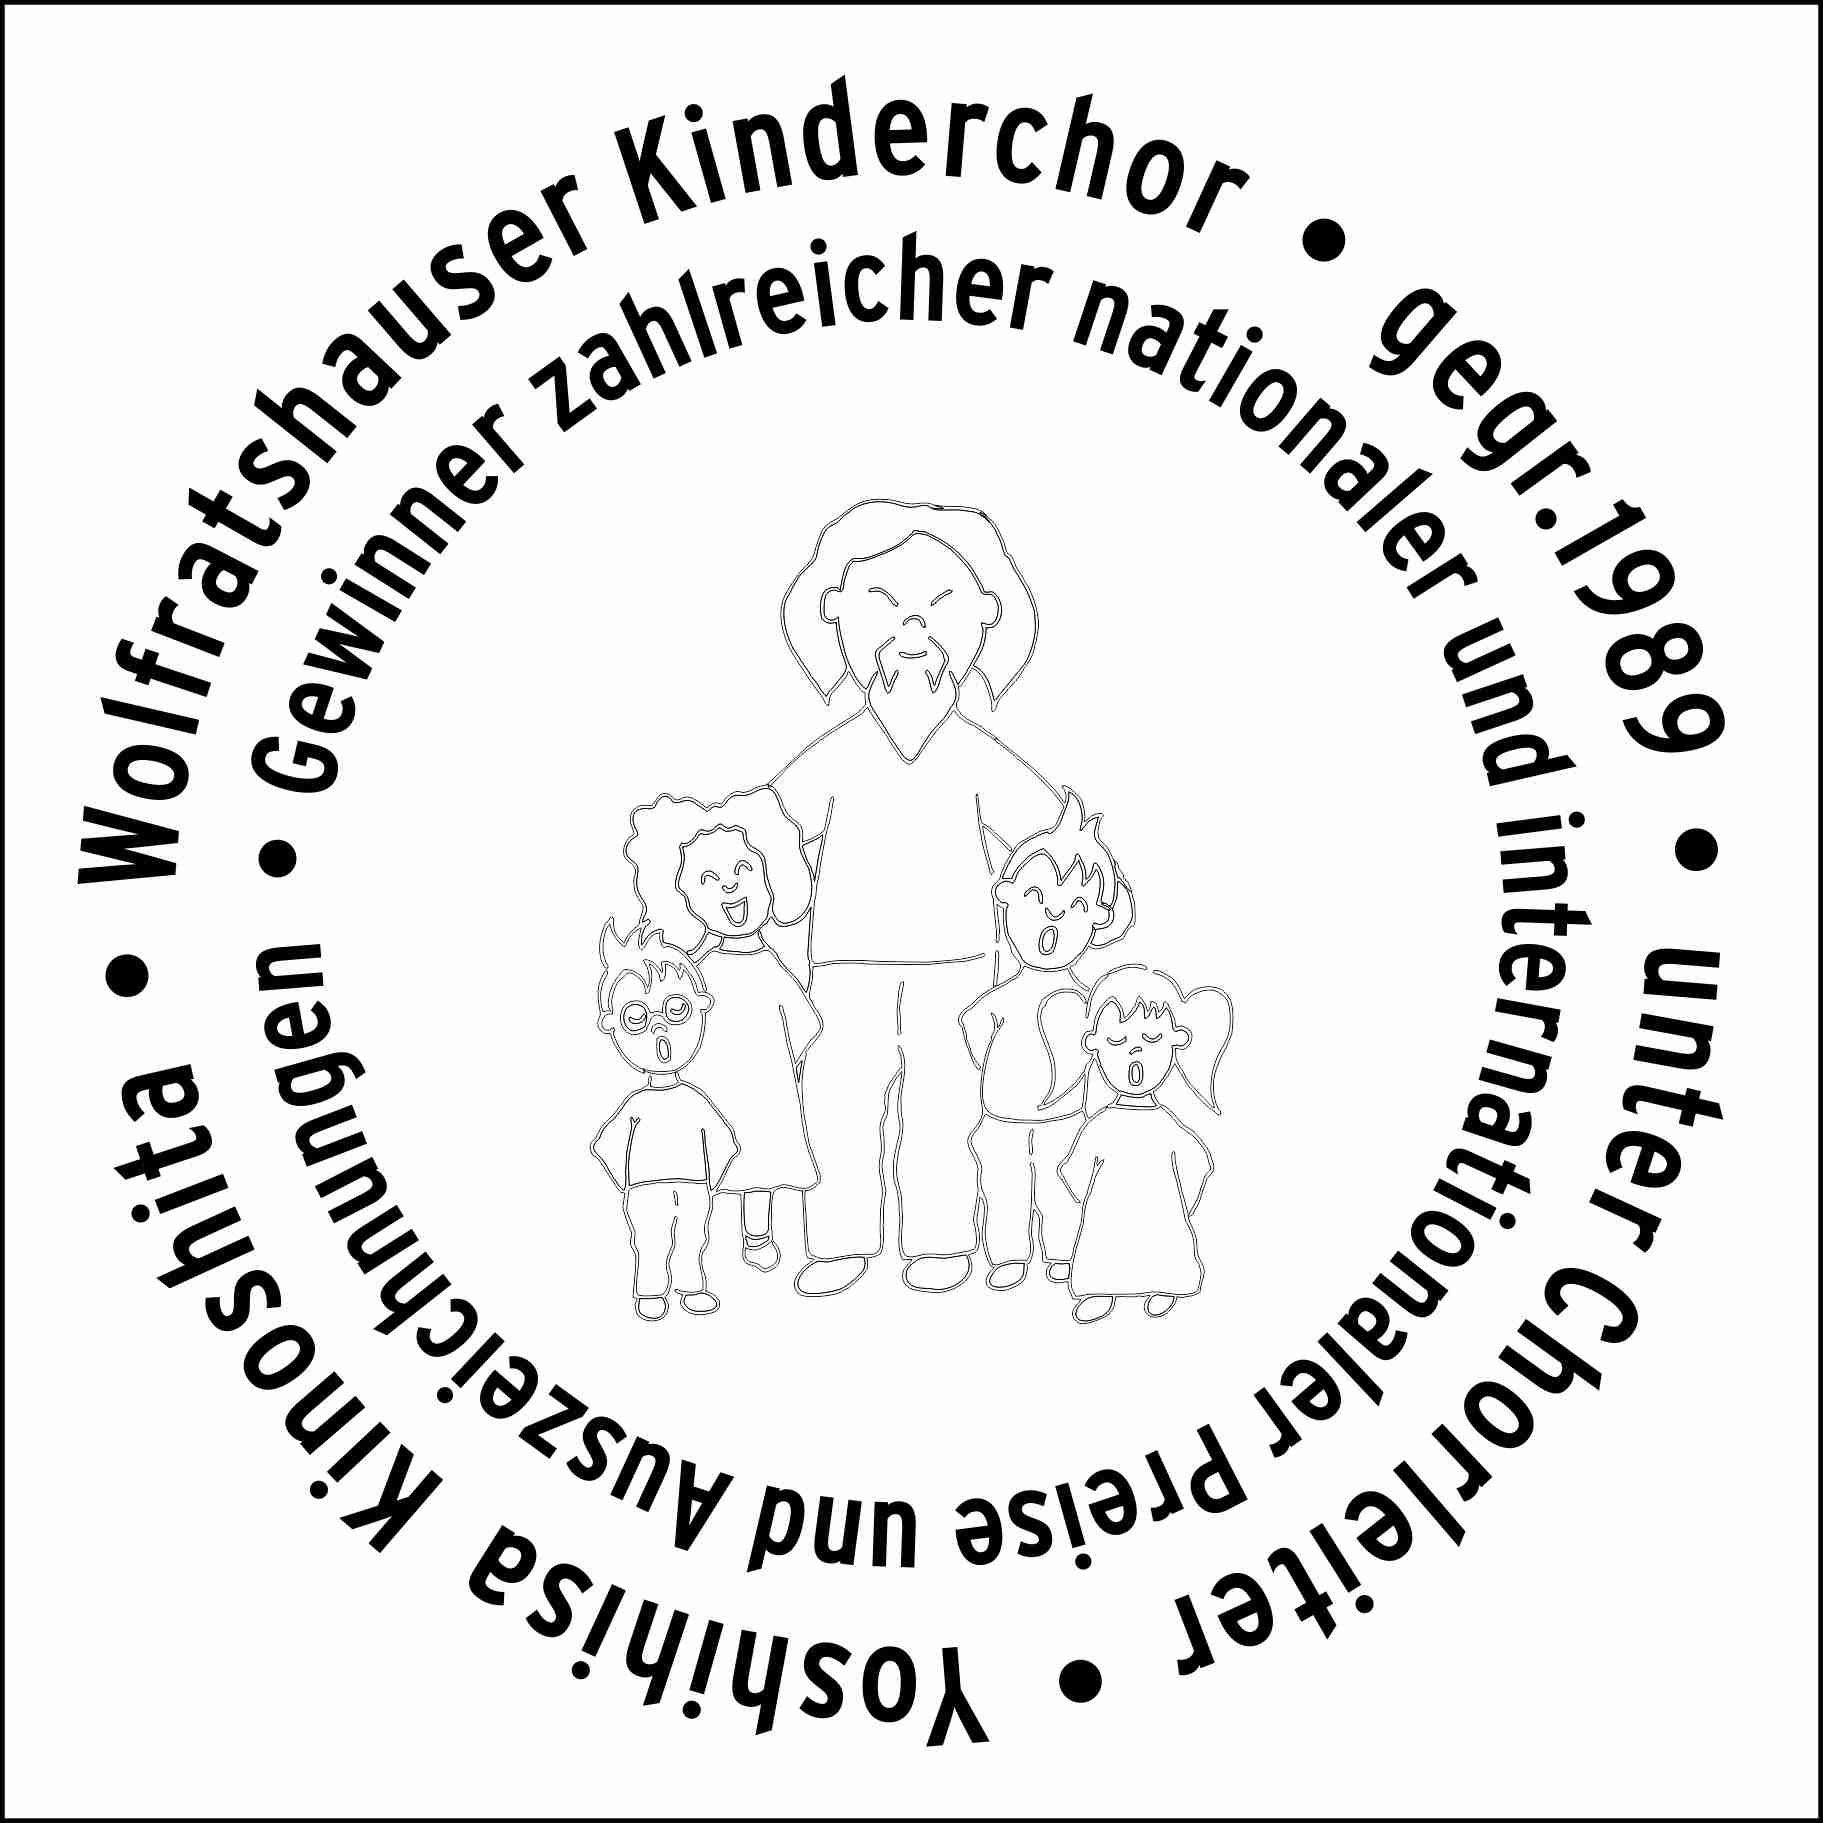 2016 Kinderchor